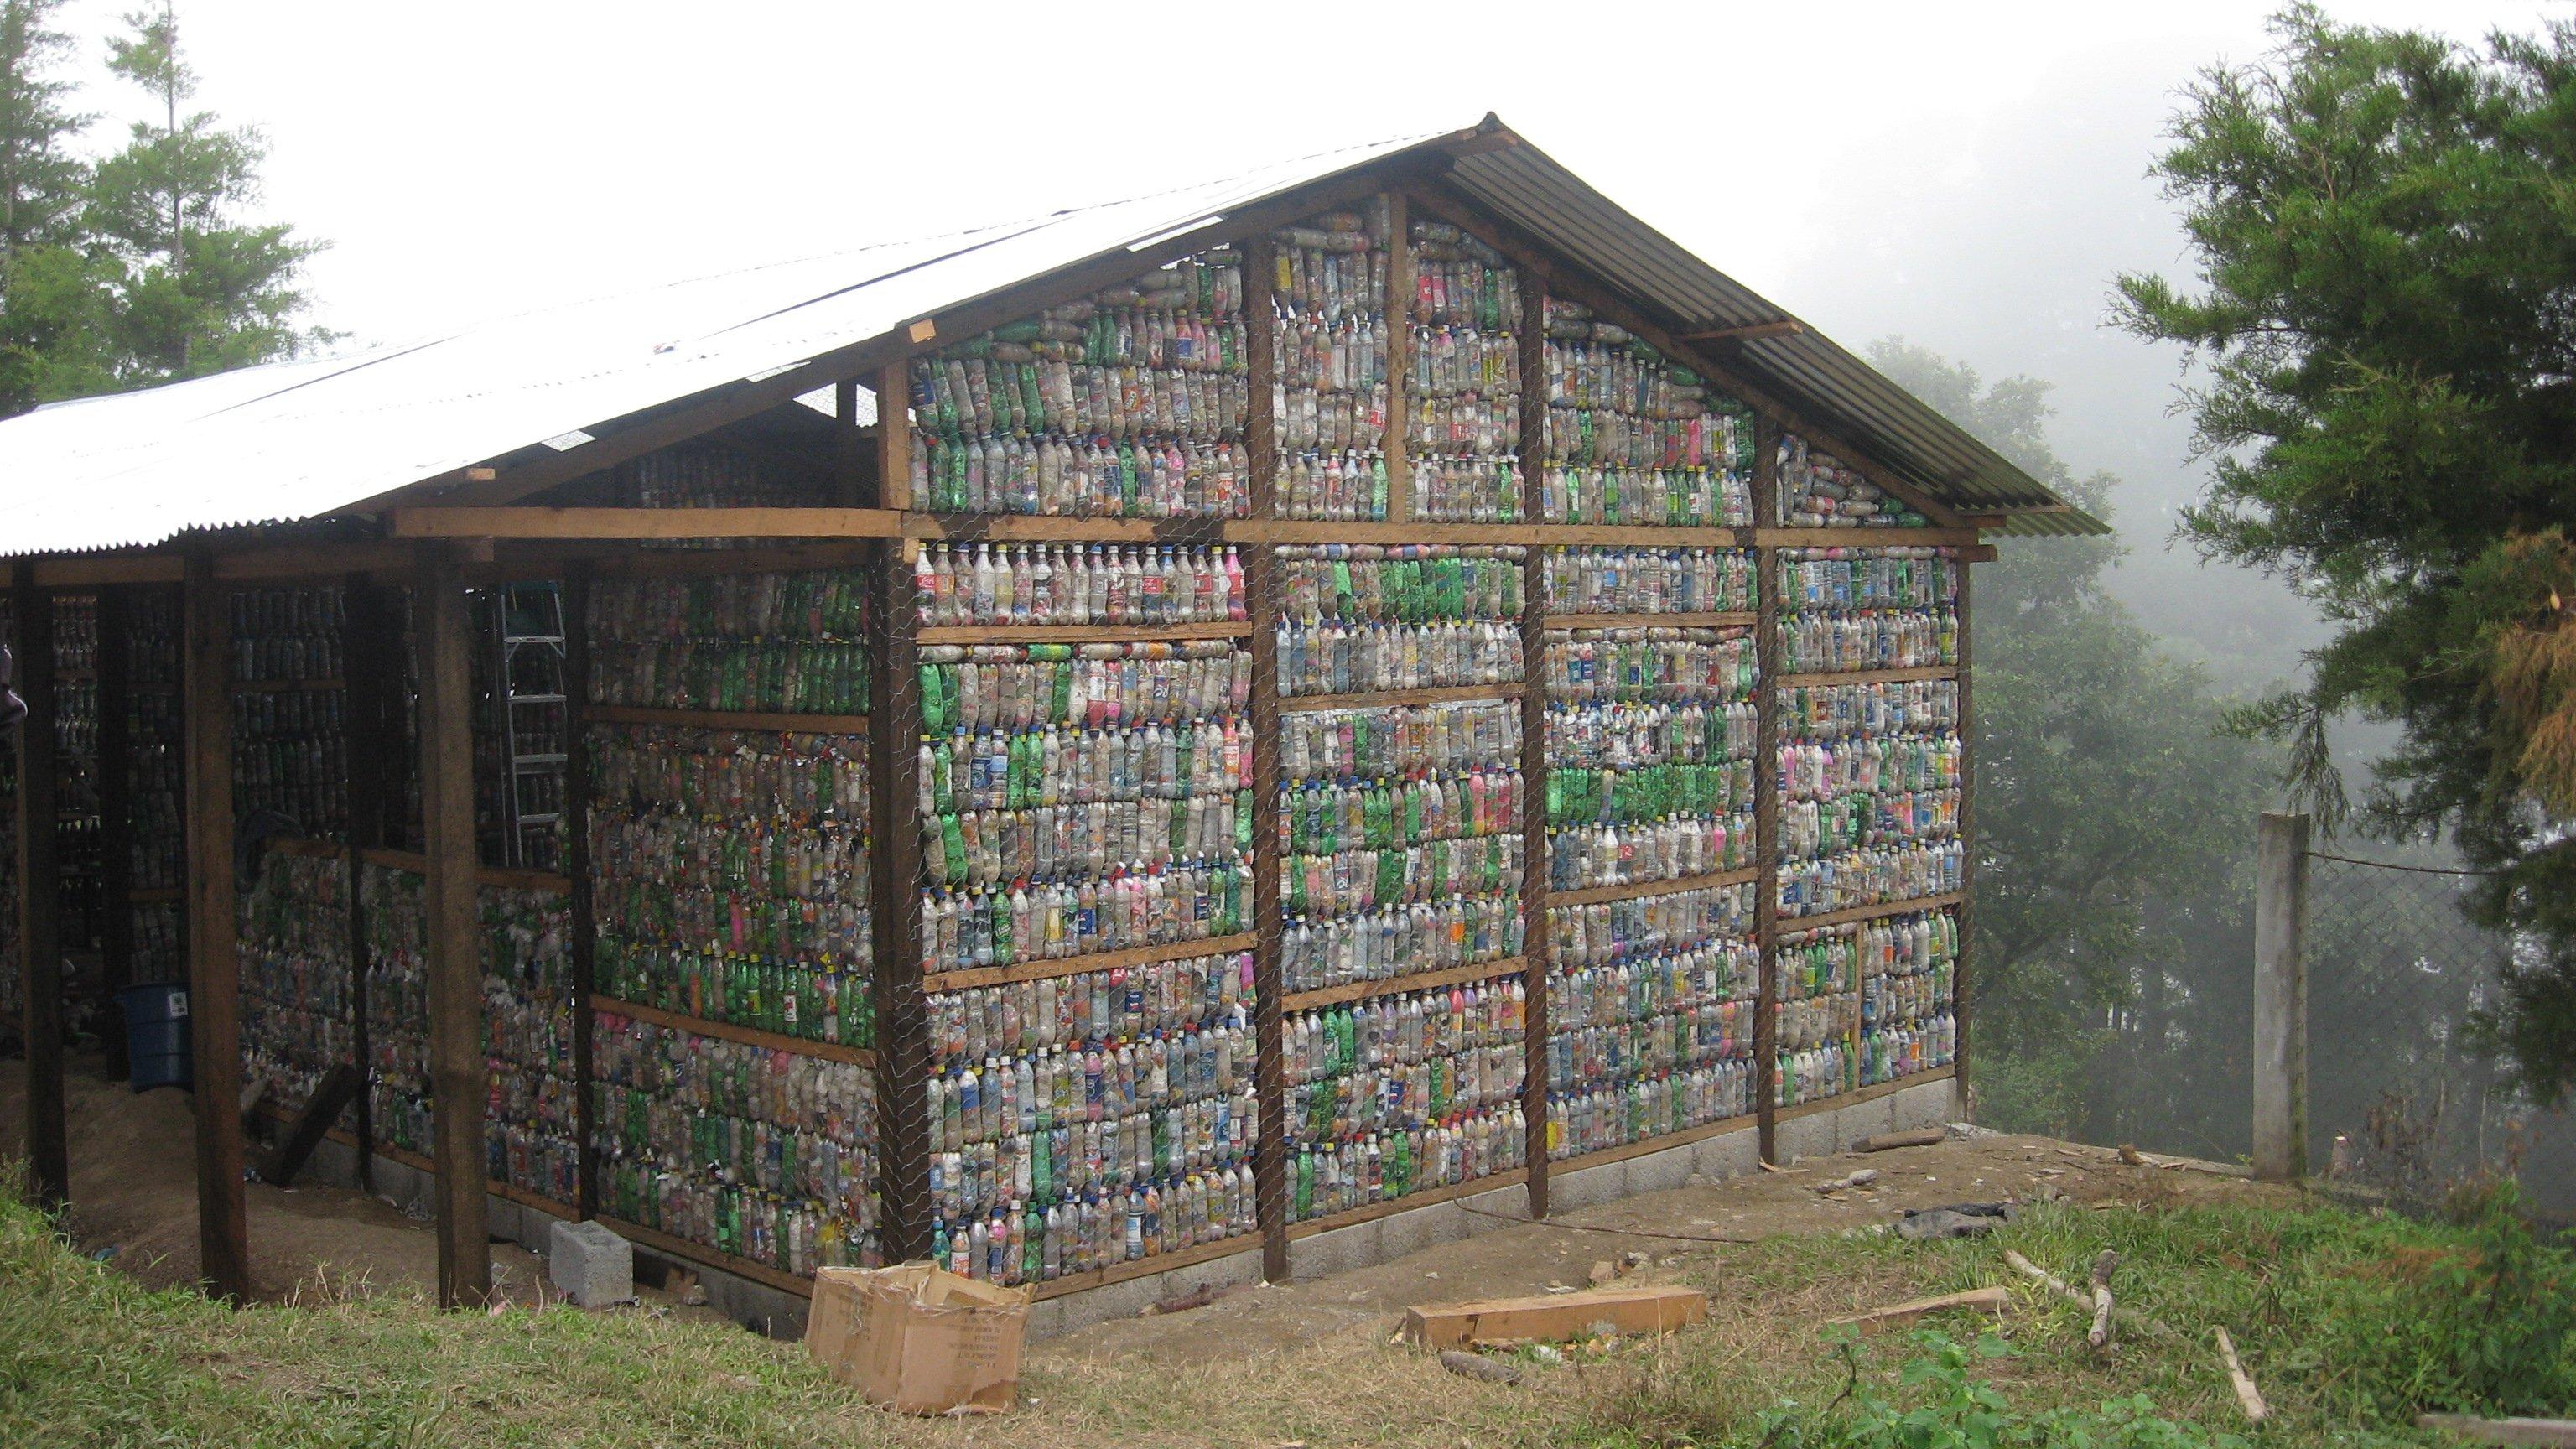 Ideas para reciclar y reutilizar objetos viejos de tu hogar - Paredes economicas ...